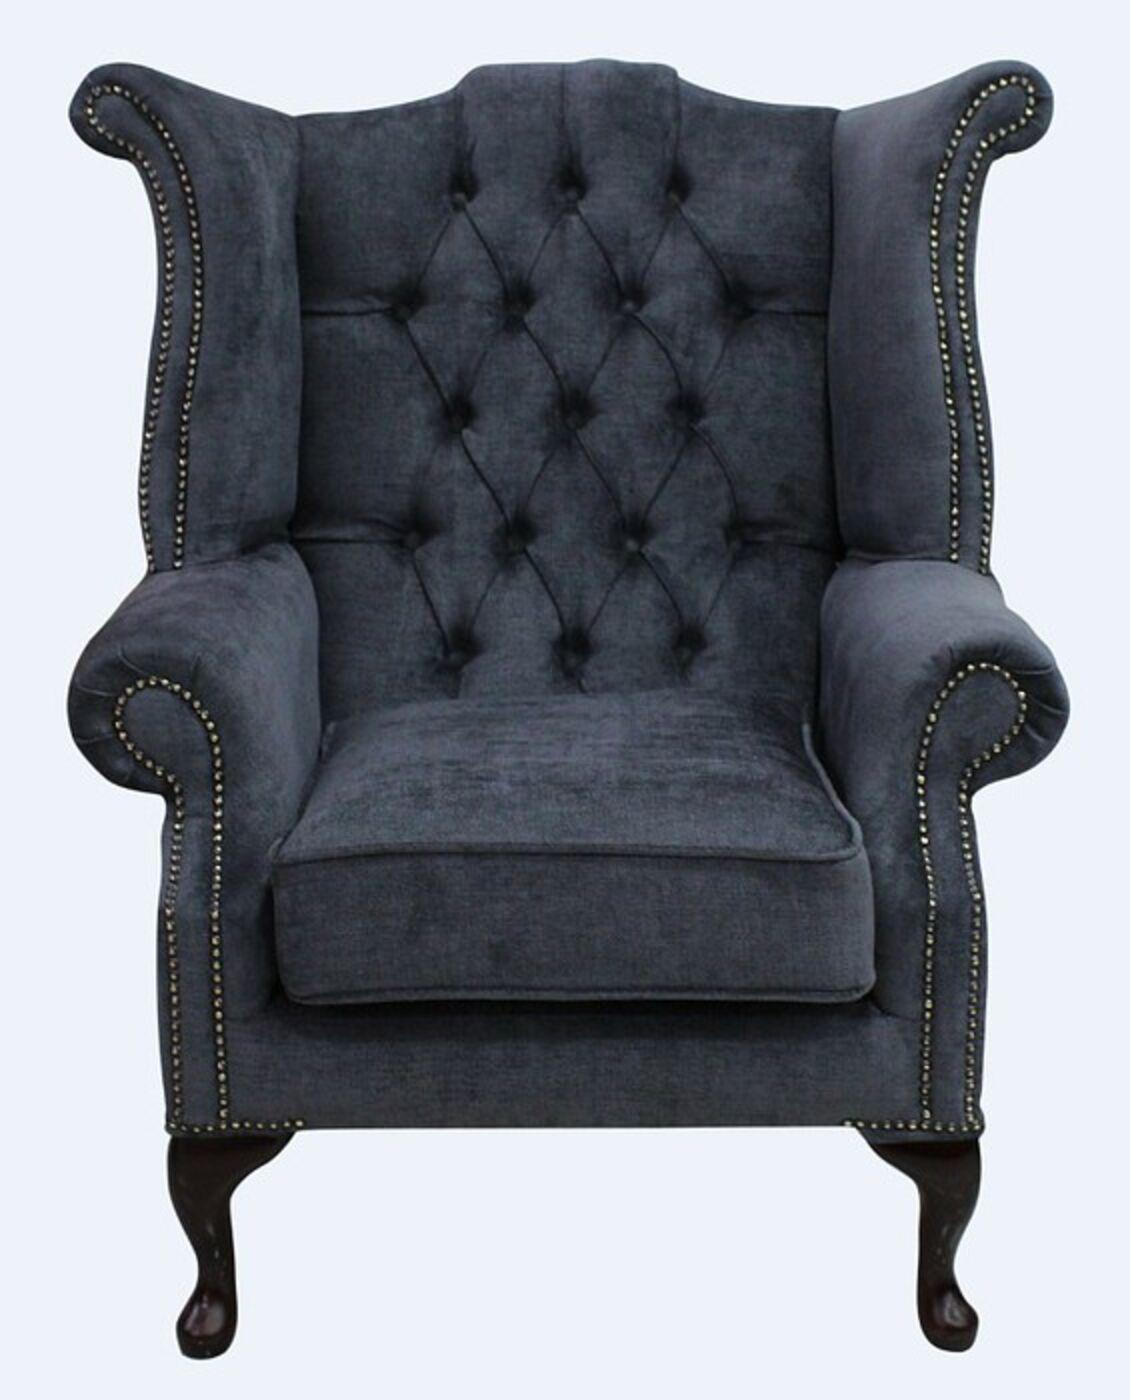 Grey Fabric Chesterfield High Back chair  DesignerSofas4U